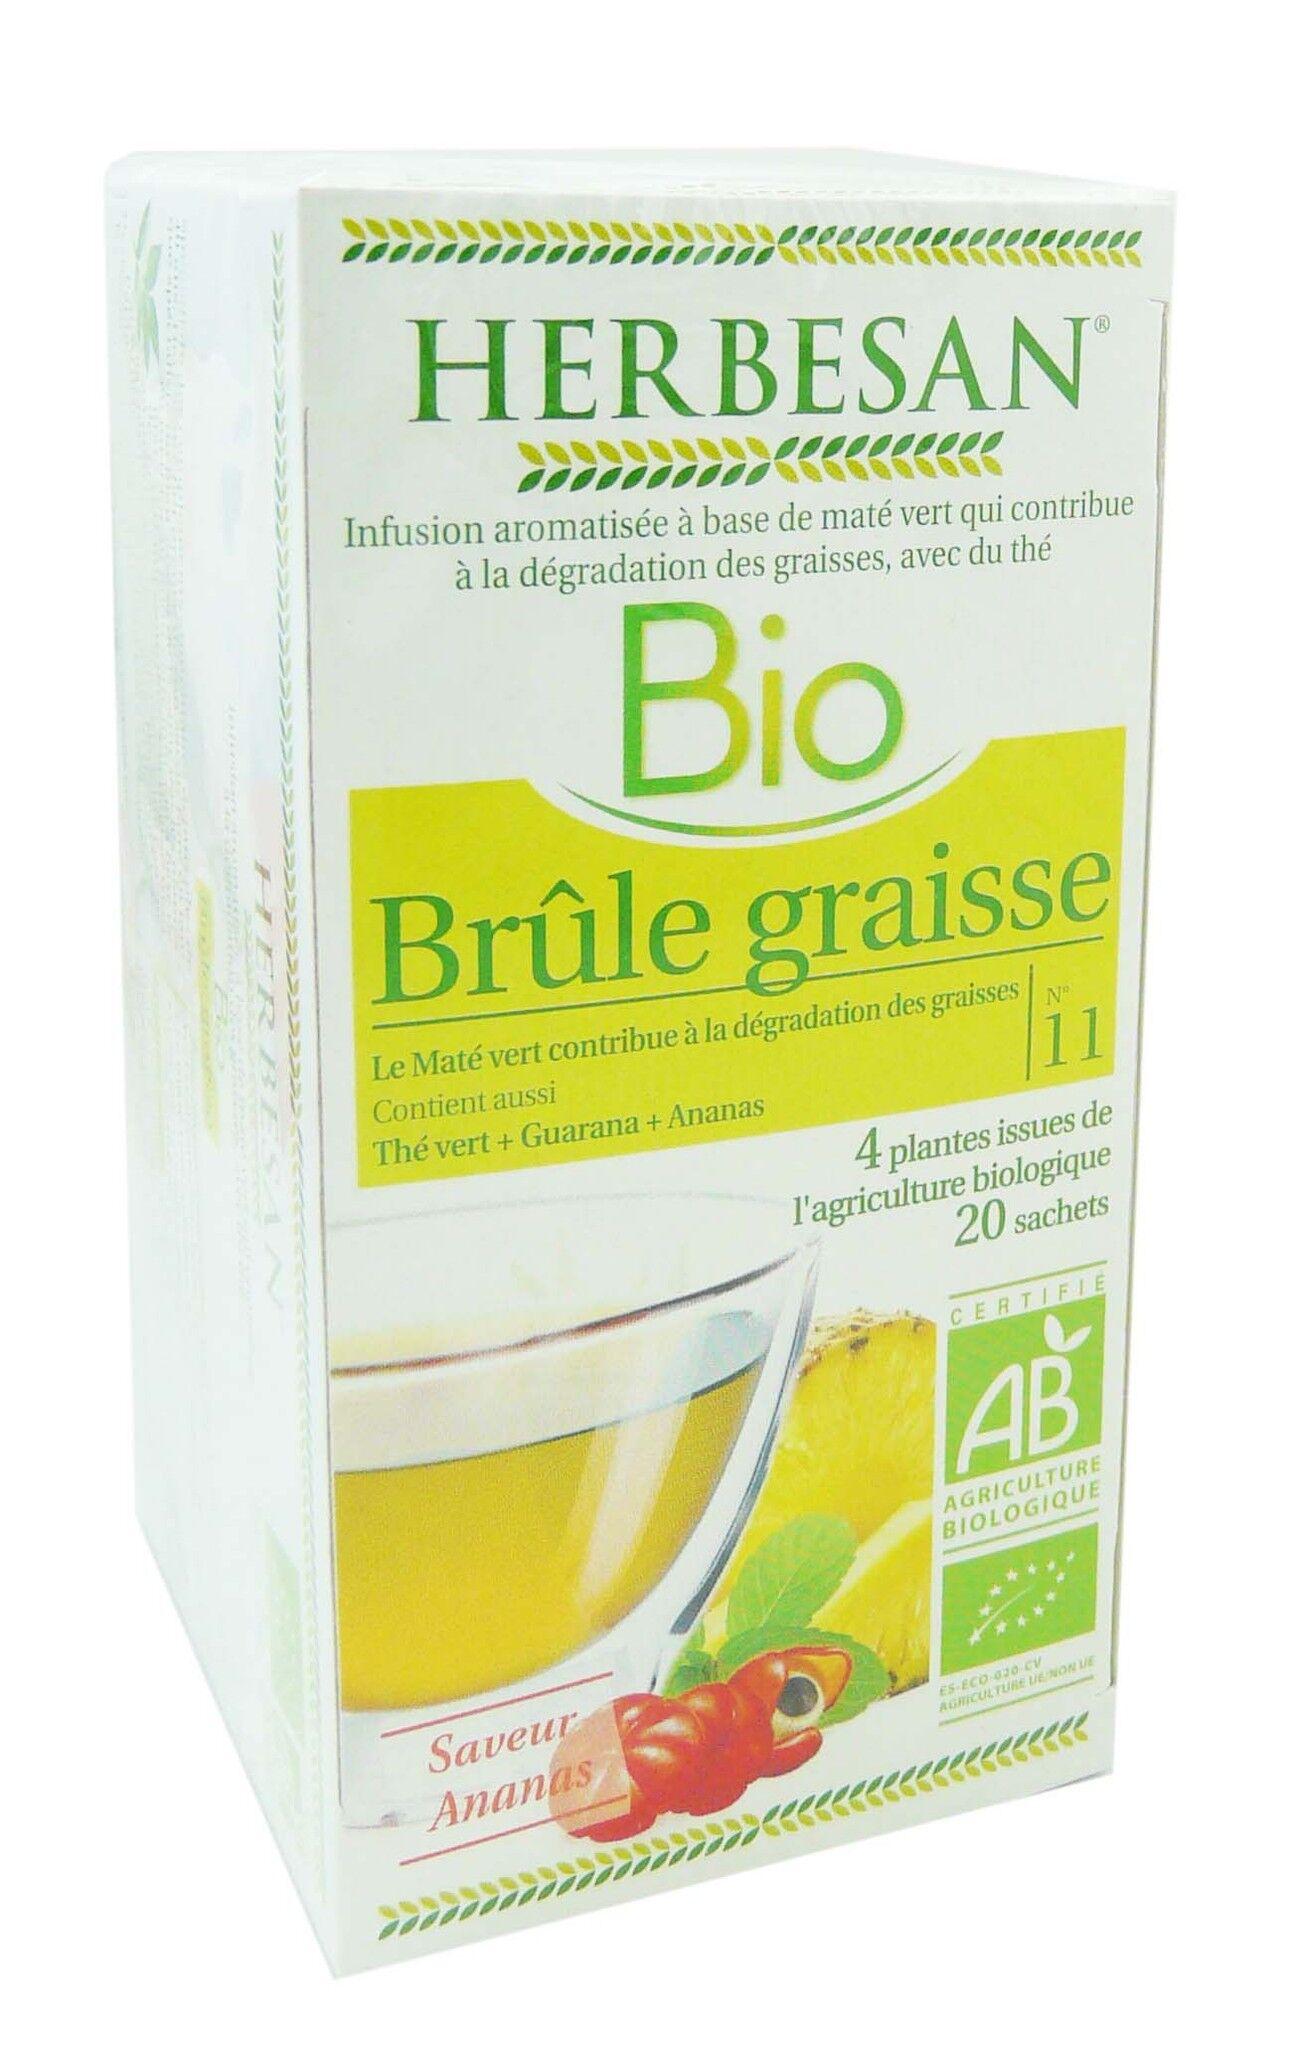 Herbesan infusion bio brule graisse 20 sachets